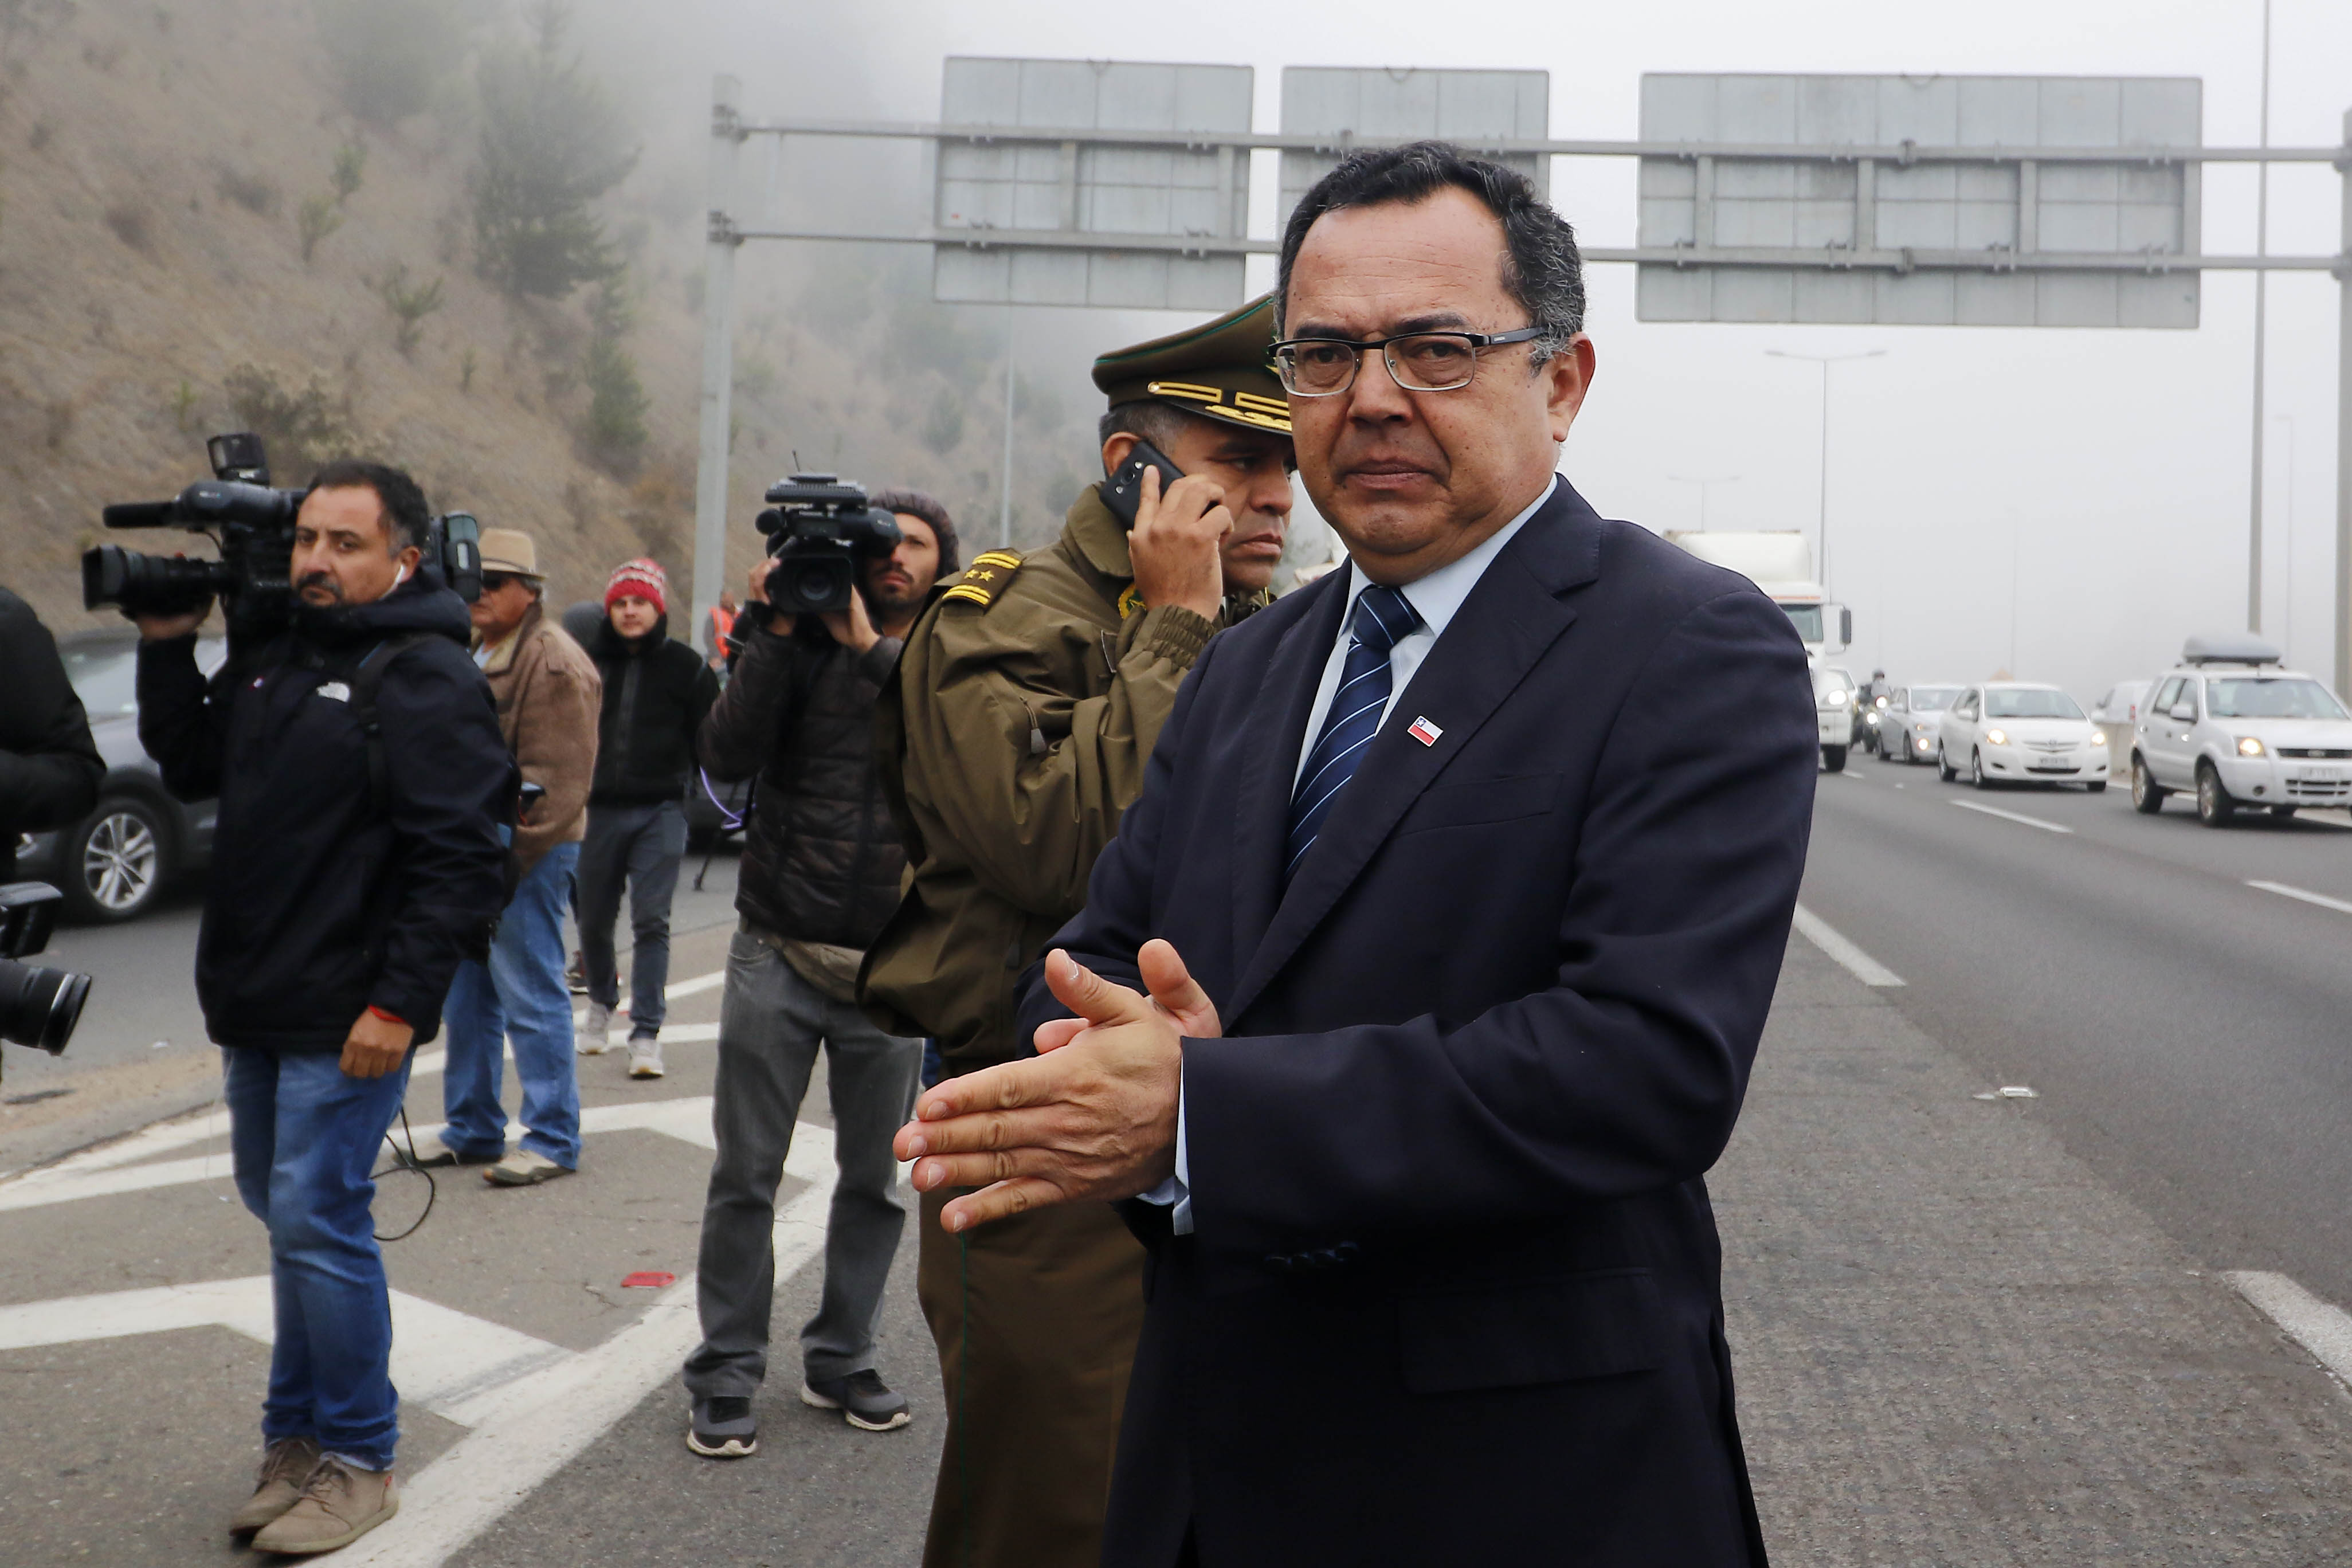 Intendente de Valparaíso, Jorge Martínez